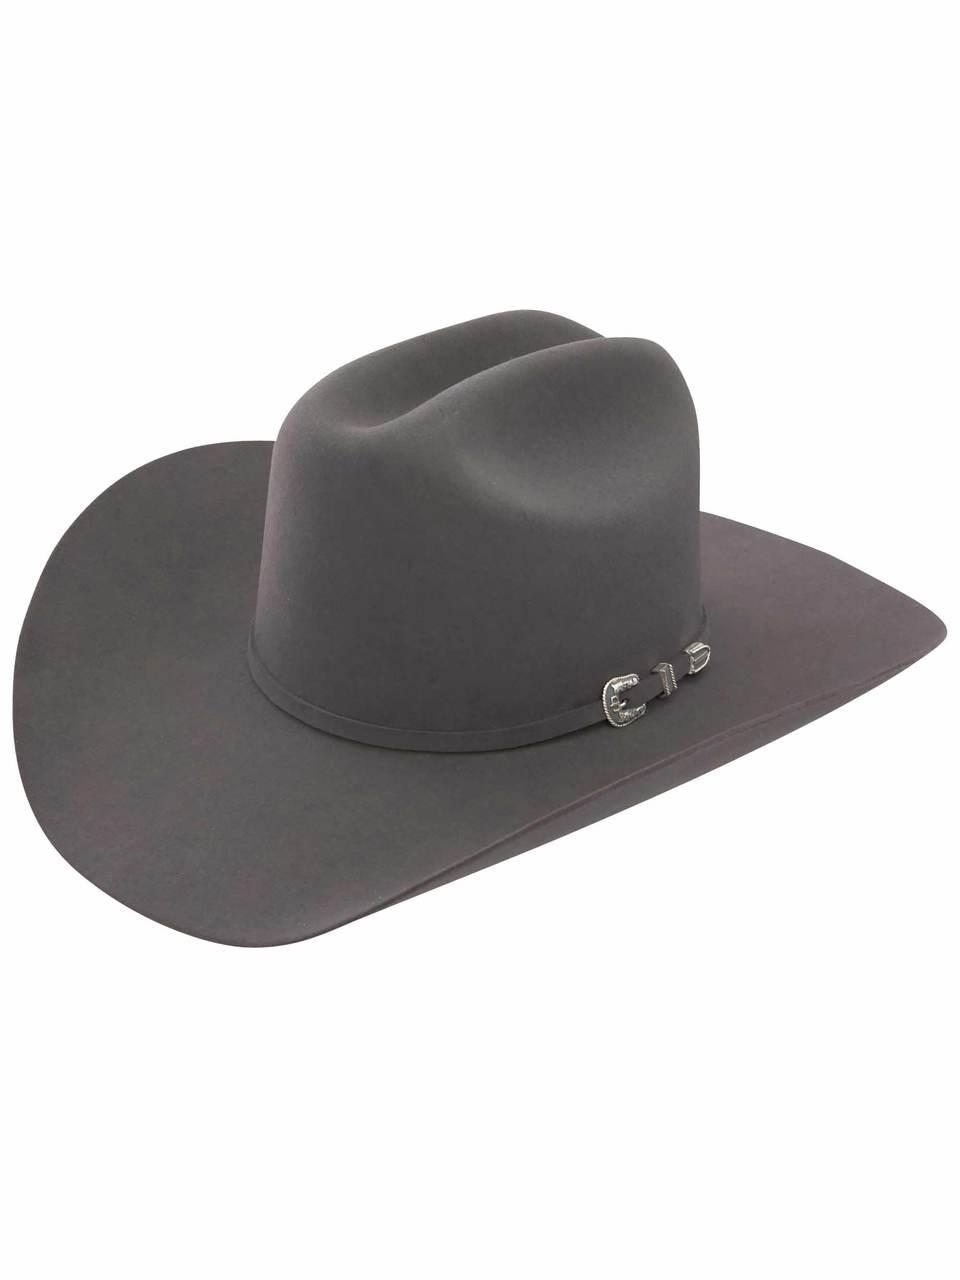 96aa4a3ee725b5 STETSON SKYLINE GRANITE GREY 6X FUR FELT COWBOY HAT - Jackson's Western